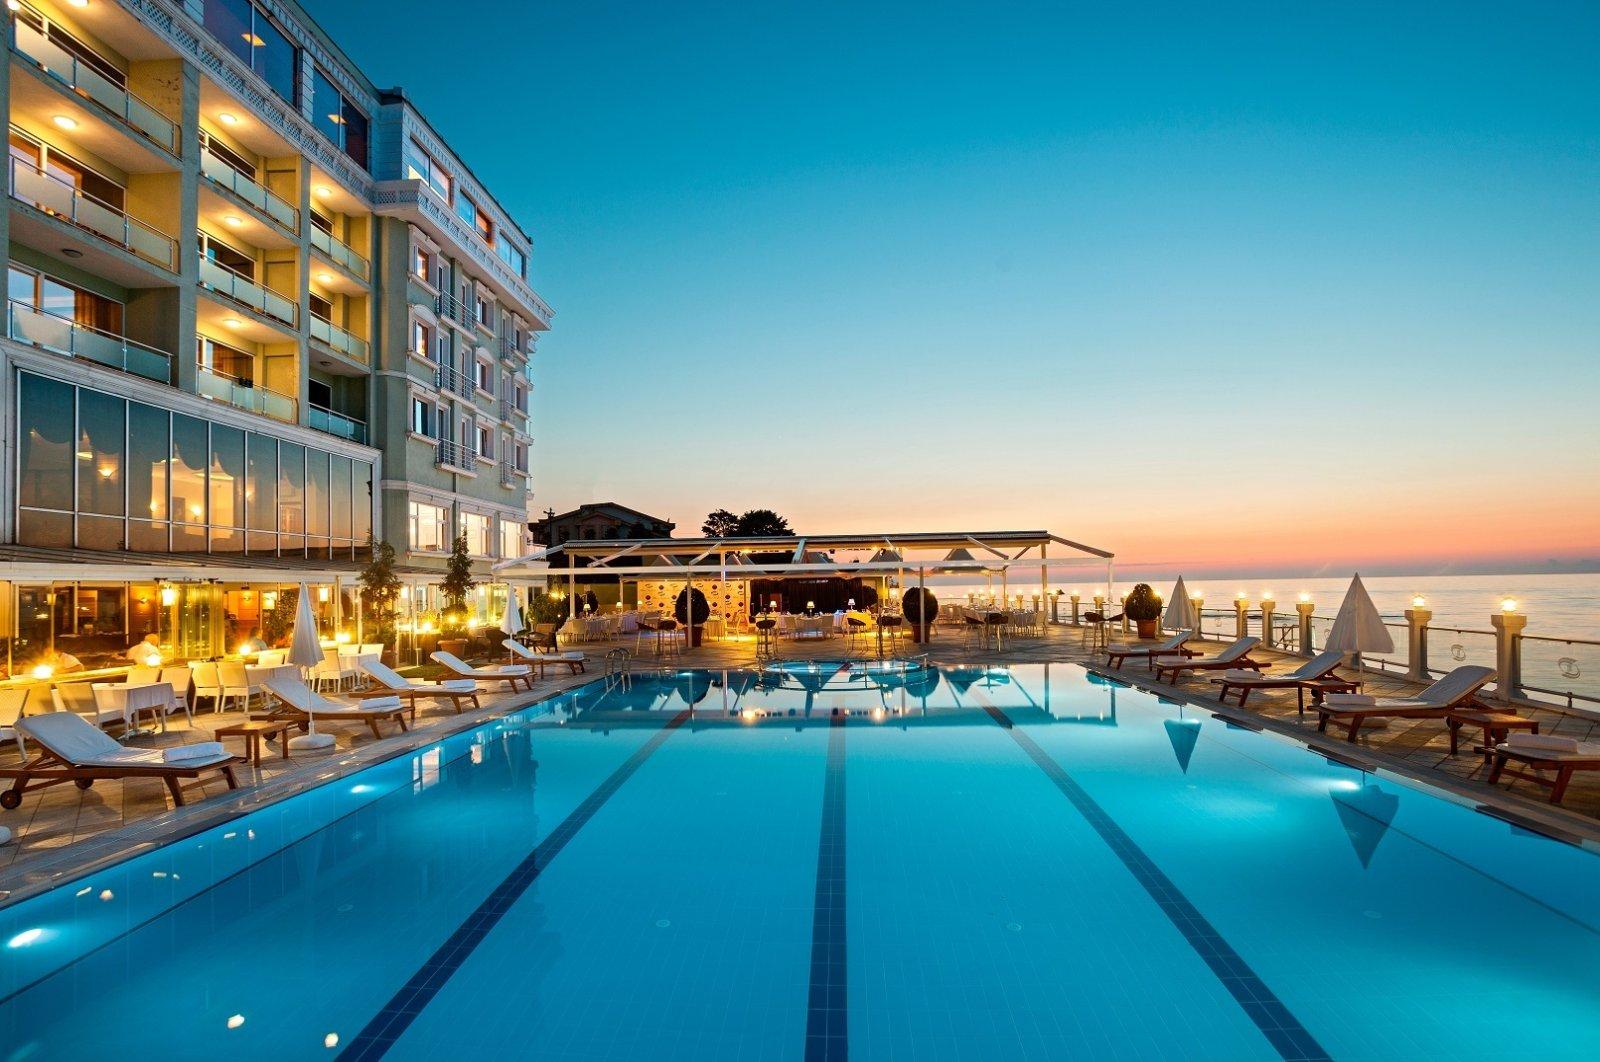 The La Quinta by Wyndham hotel in Turkey's northern Giresun province. (Photo courtesy of Wyndham)